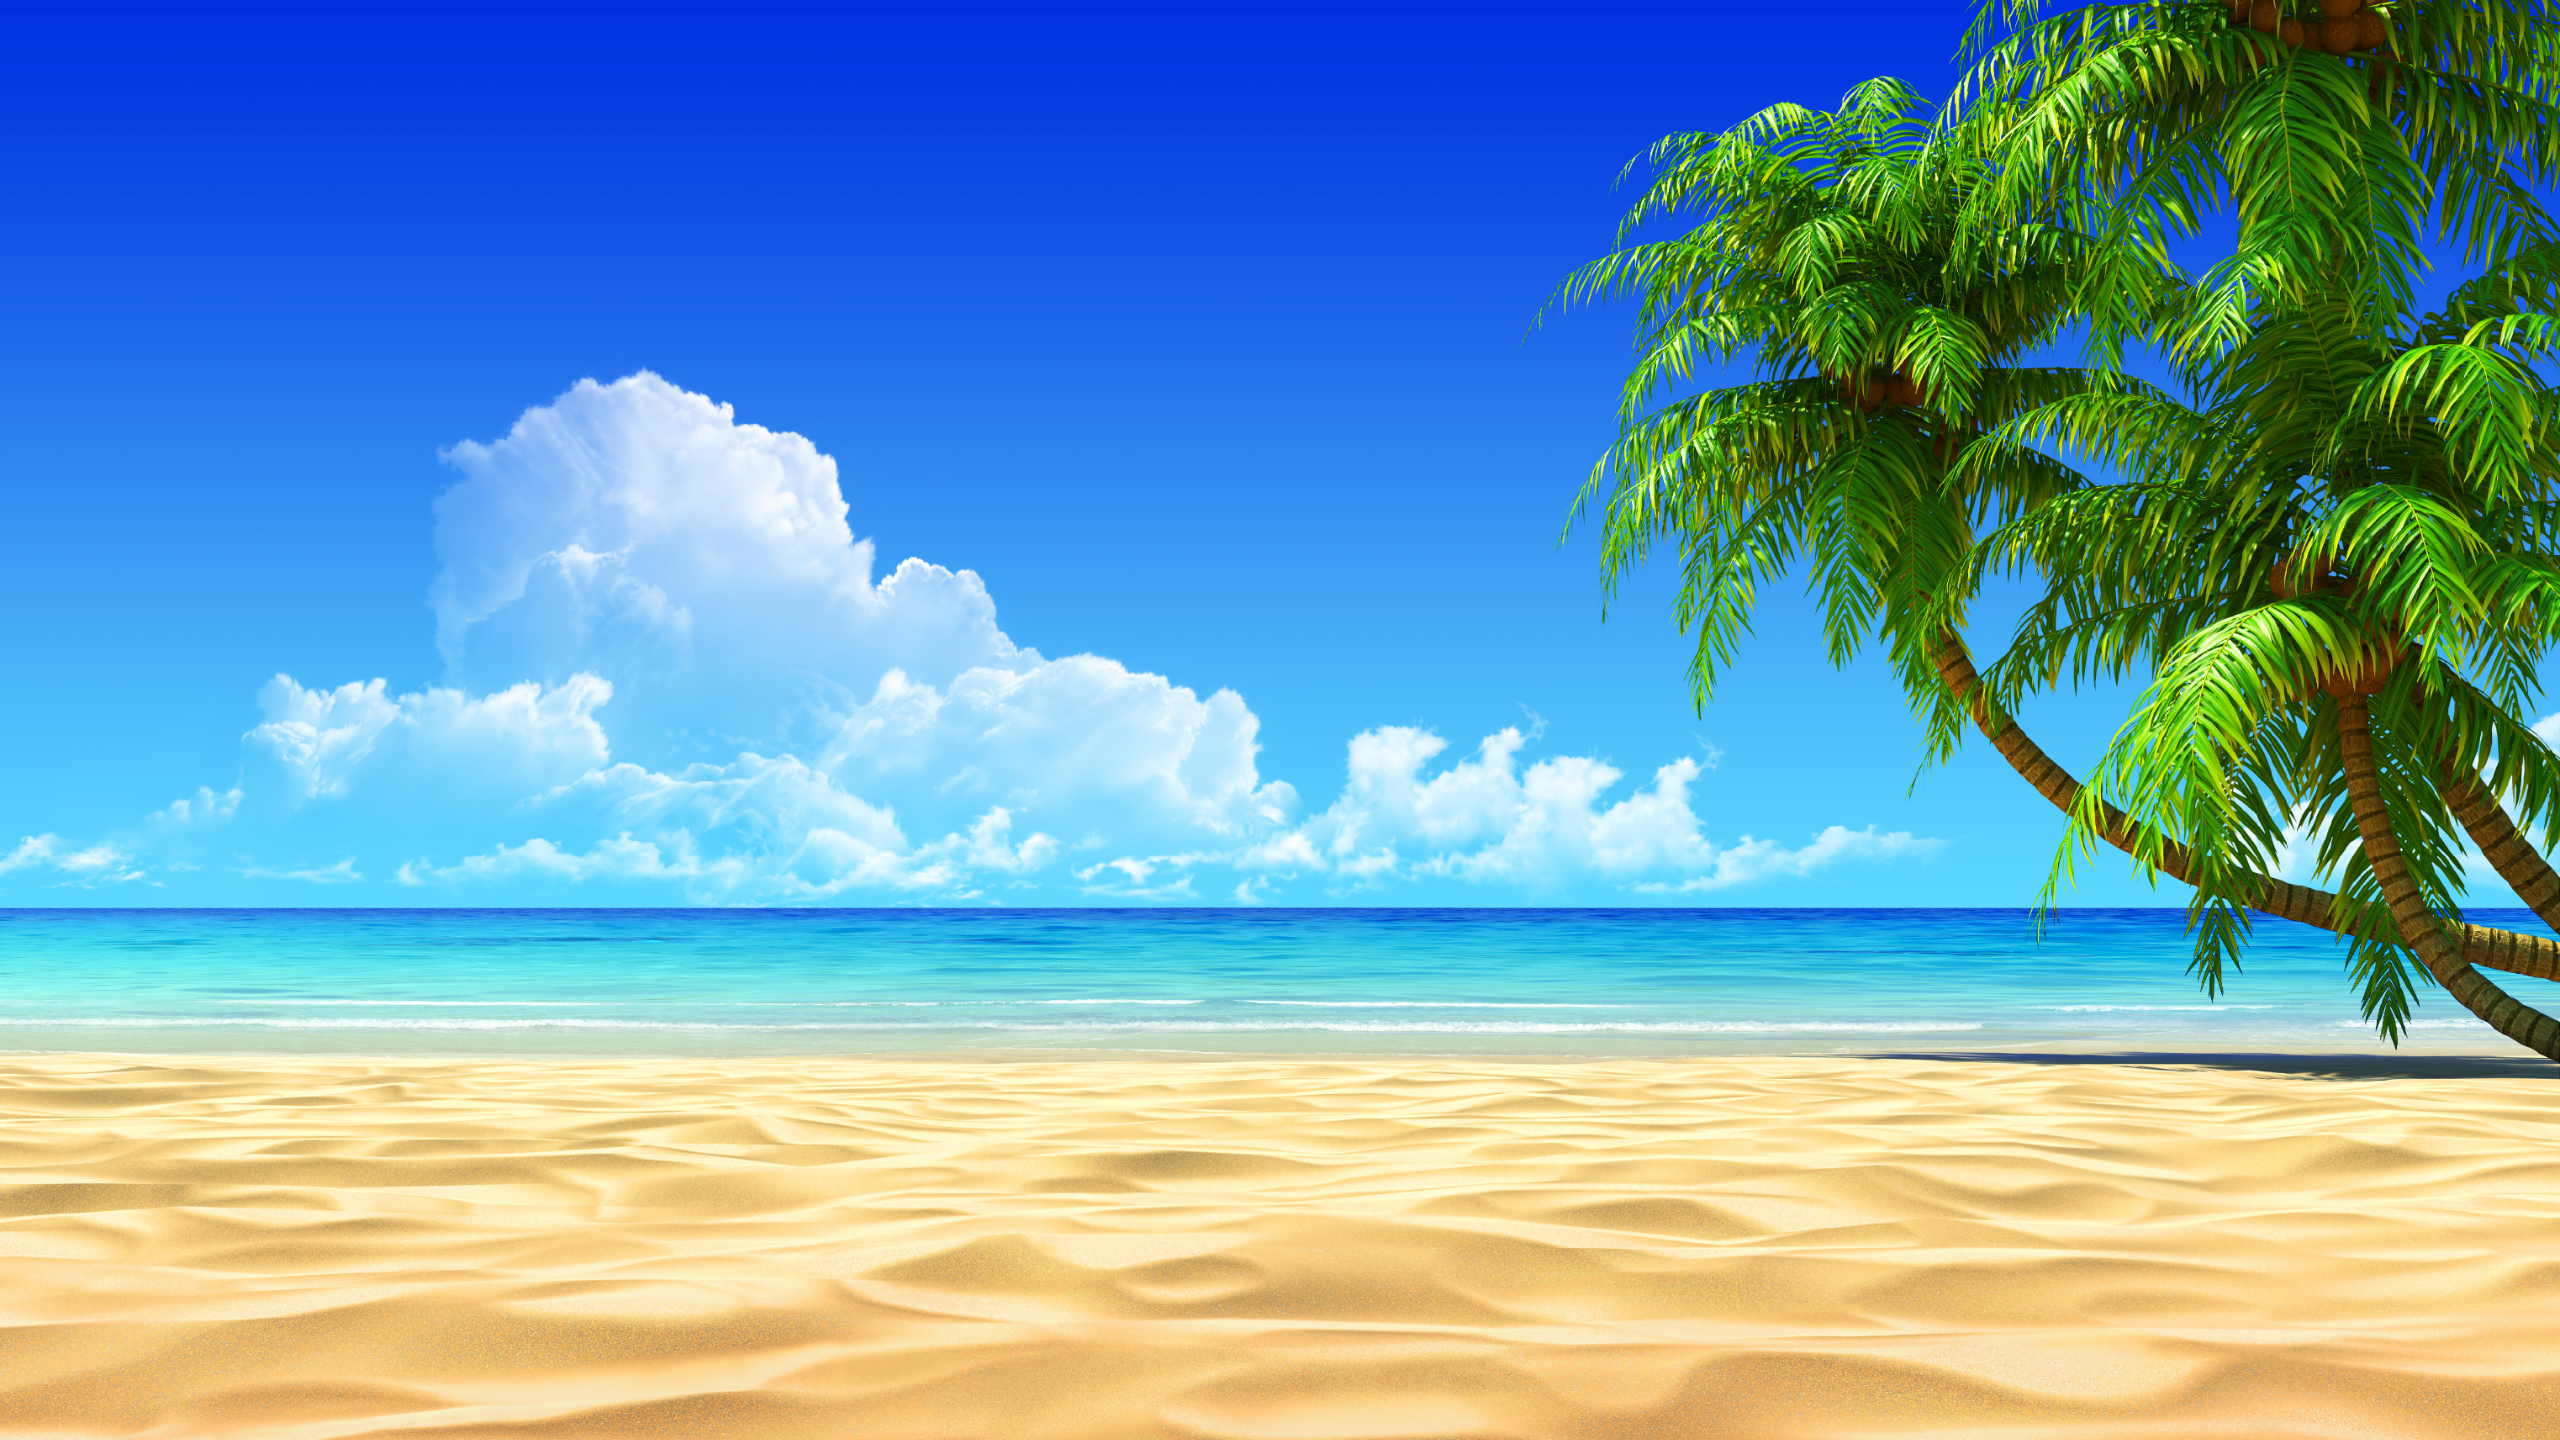 Beach Background Clipart - .-Beach Background Clipart - .-1